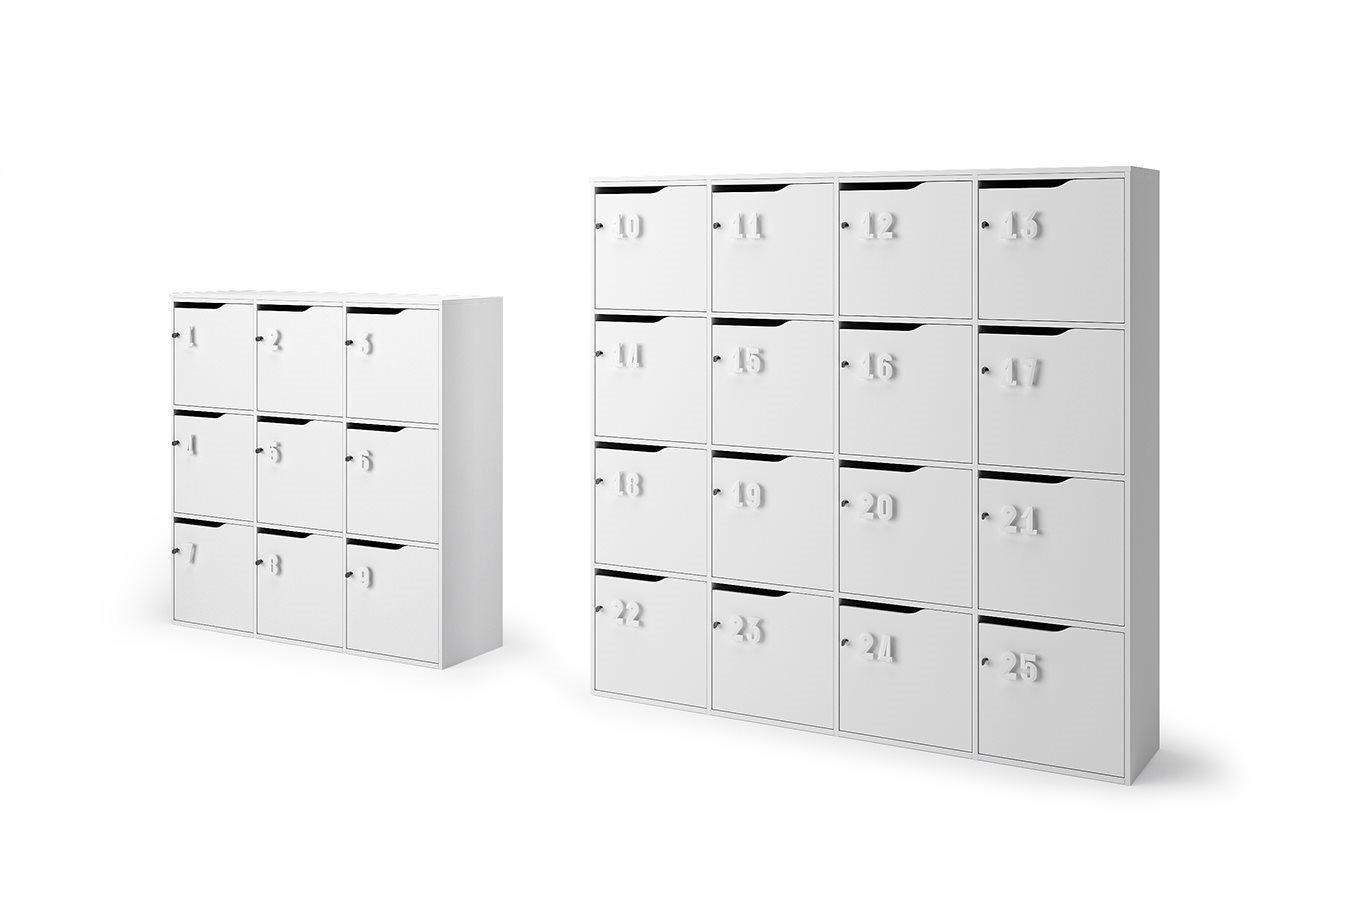 DVO_storage_lockers2.jpg